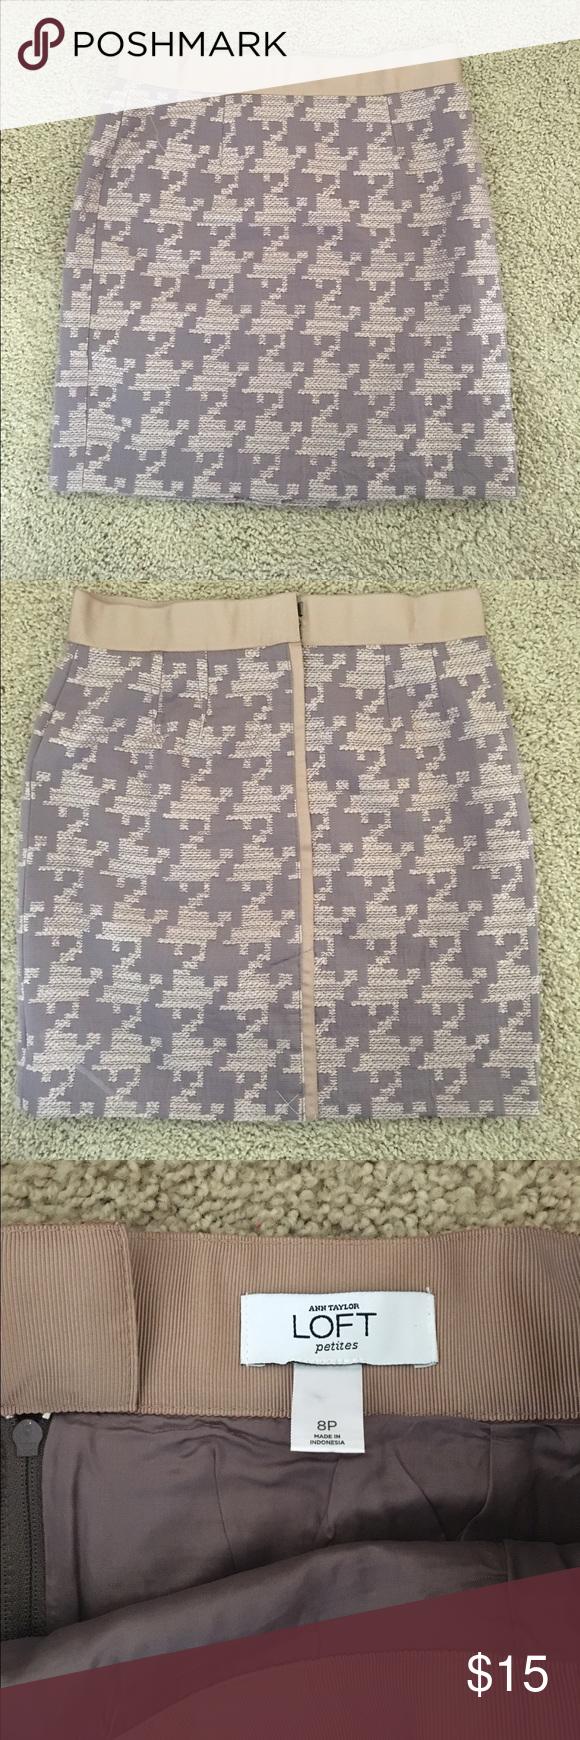 Loft skirt! Worn once! Cute loft skirt - great for work or casual setting! LOFT Skirts Midi